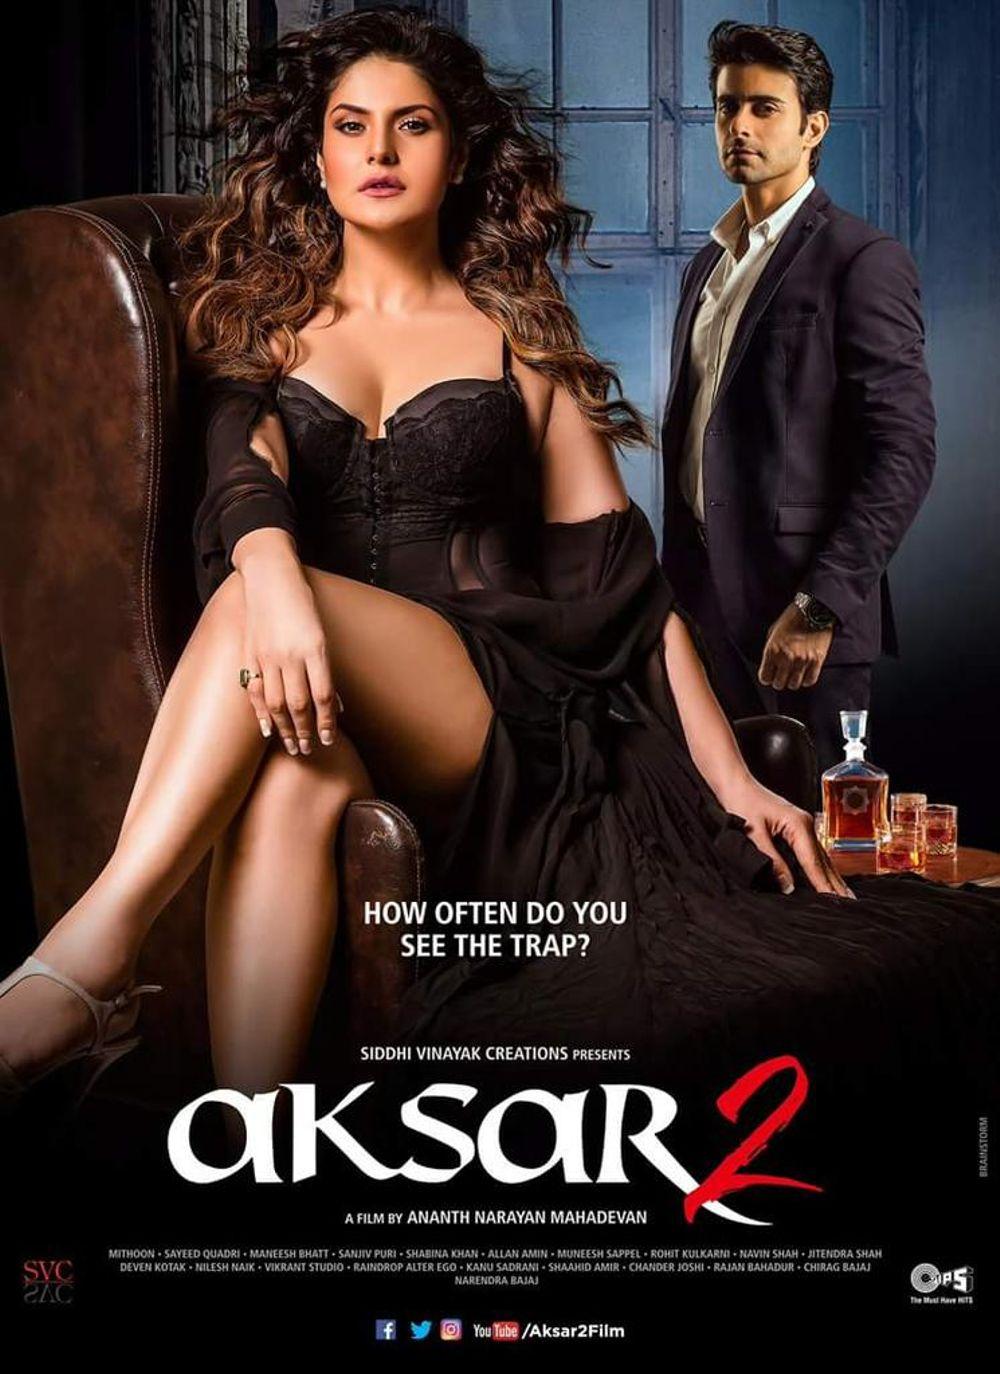 Hindi erotic films think, that